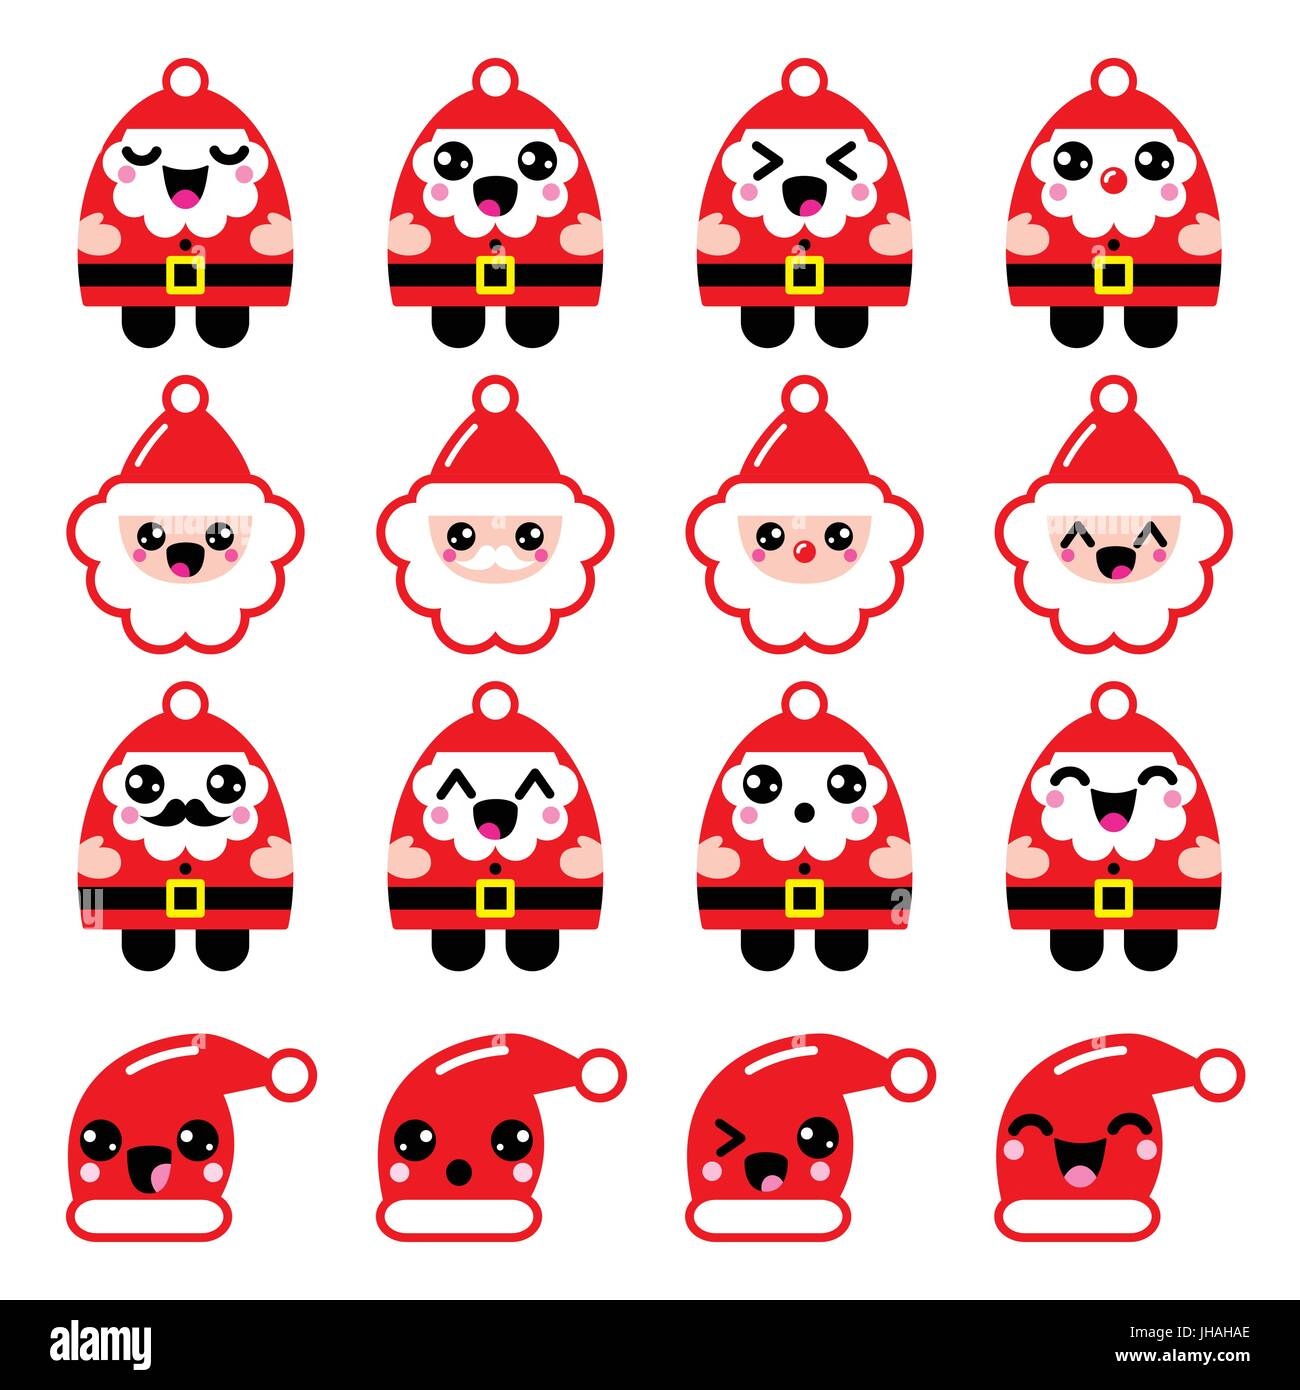 ccea86795087c Kawaii Santa Claus cute character icons - head